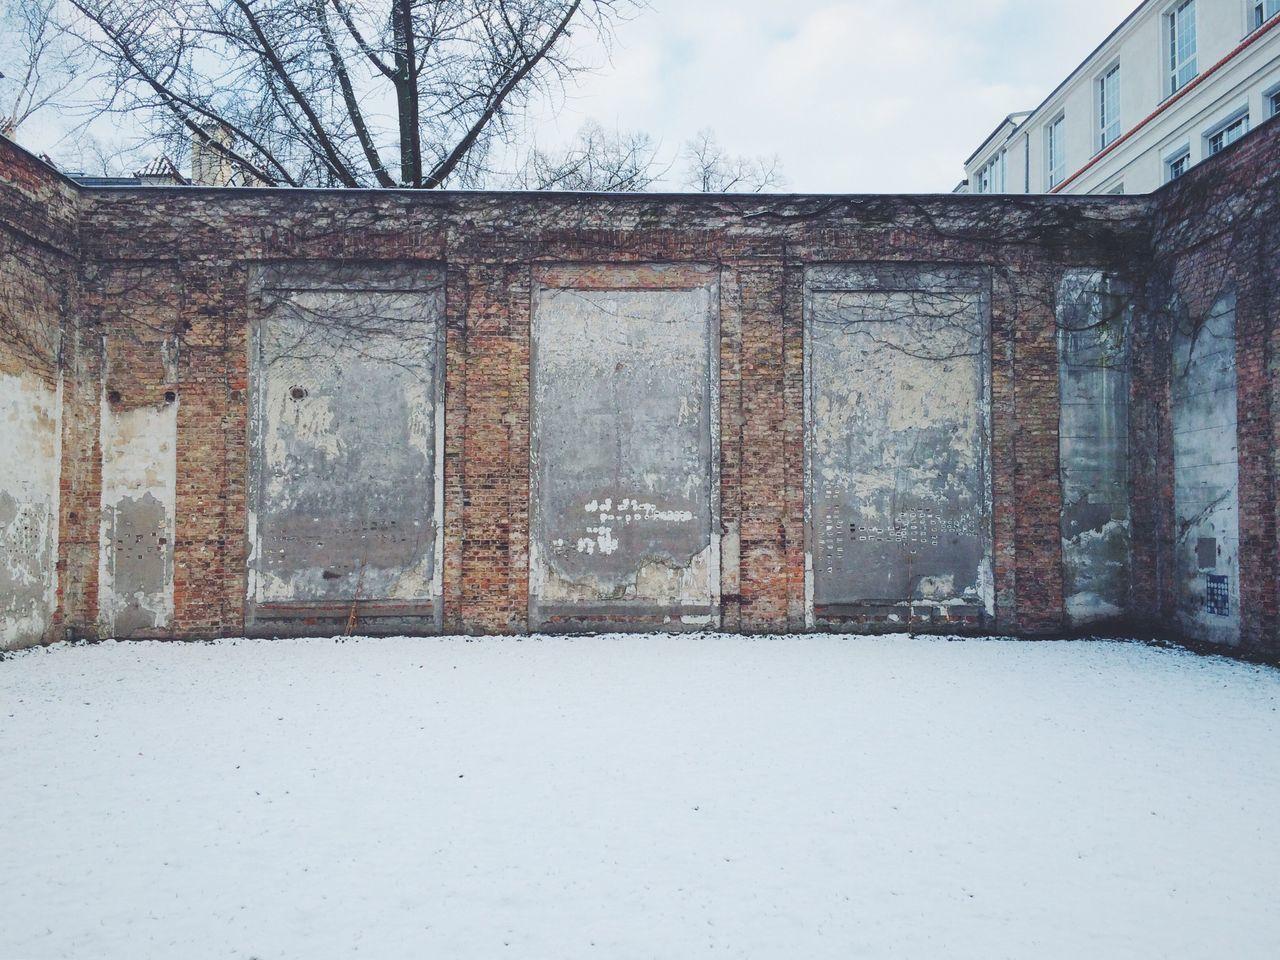 Buildings against sky during winter